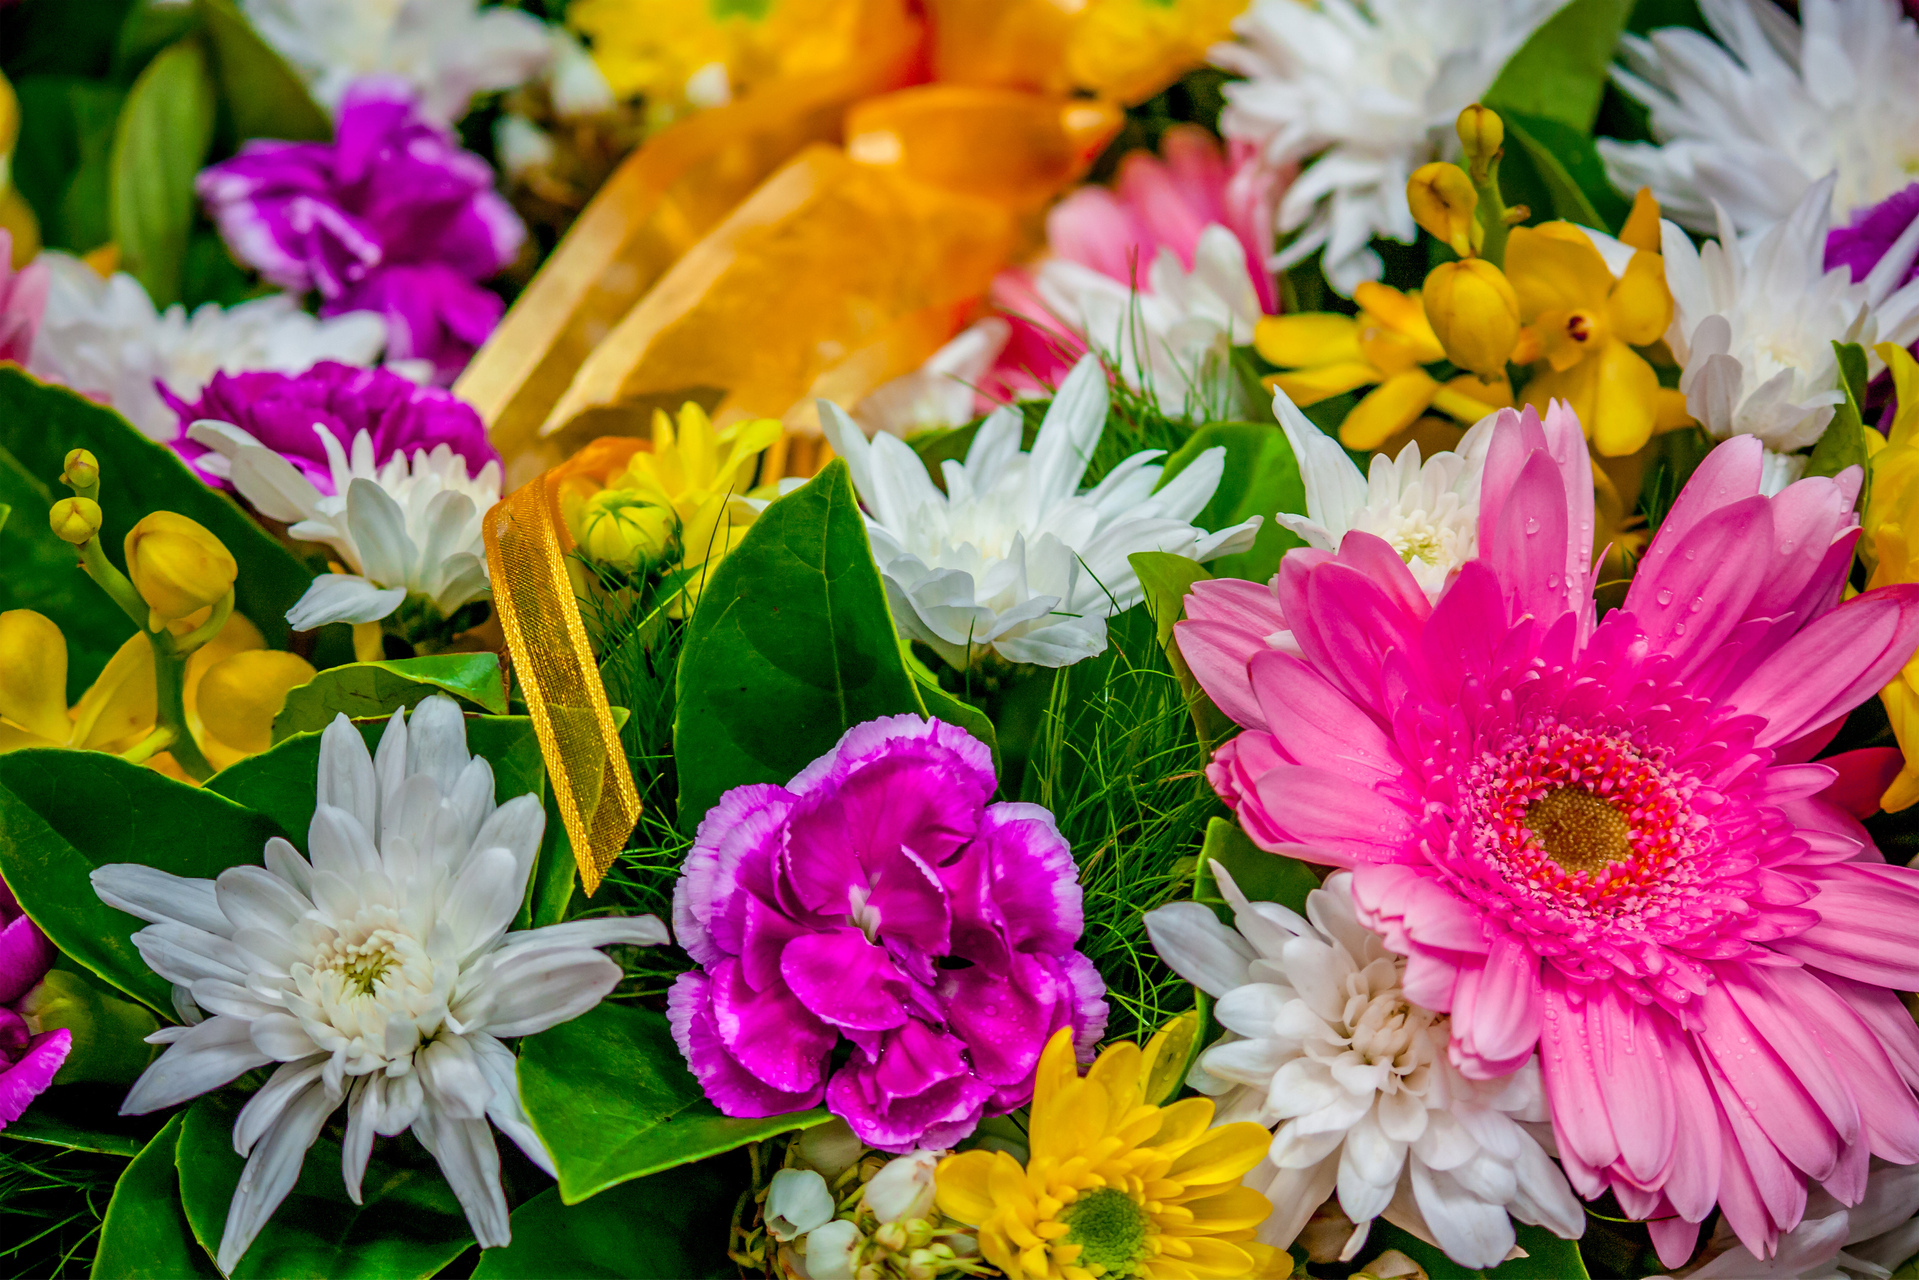 Online florists save you money